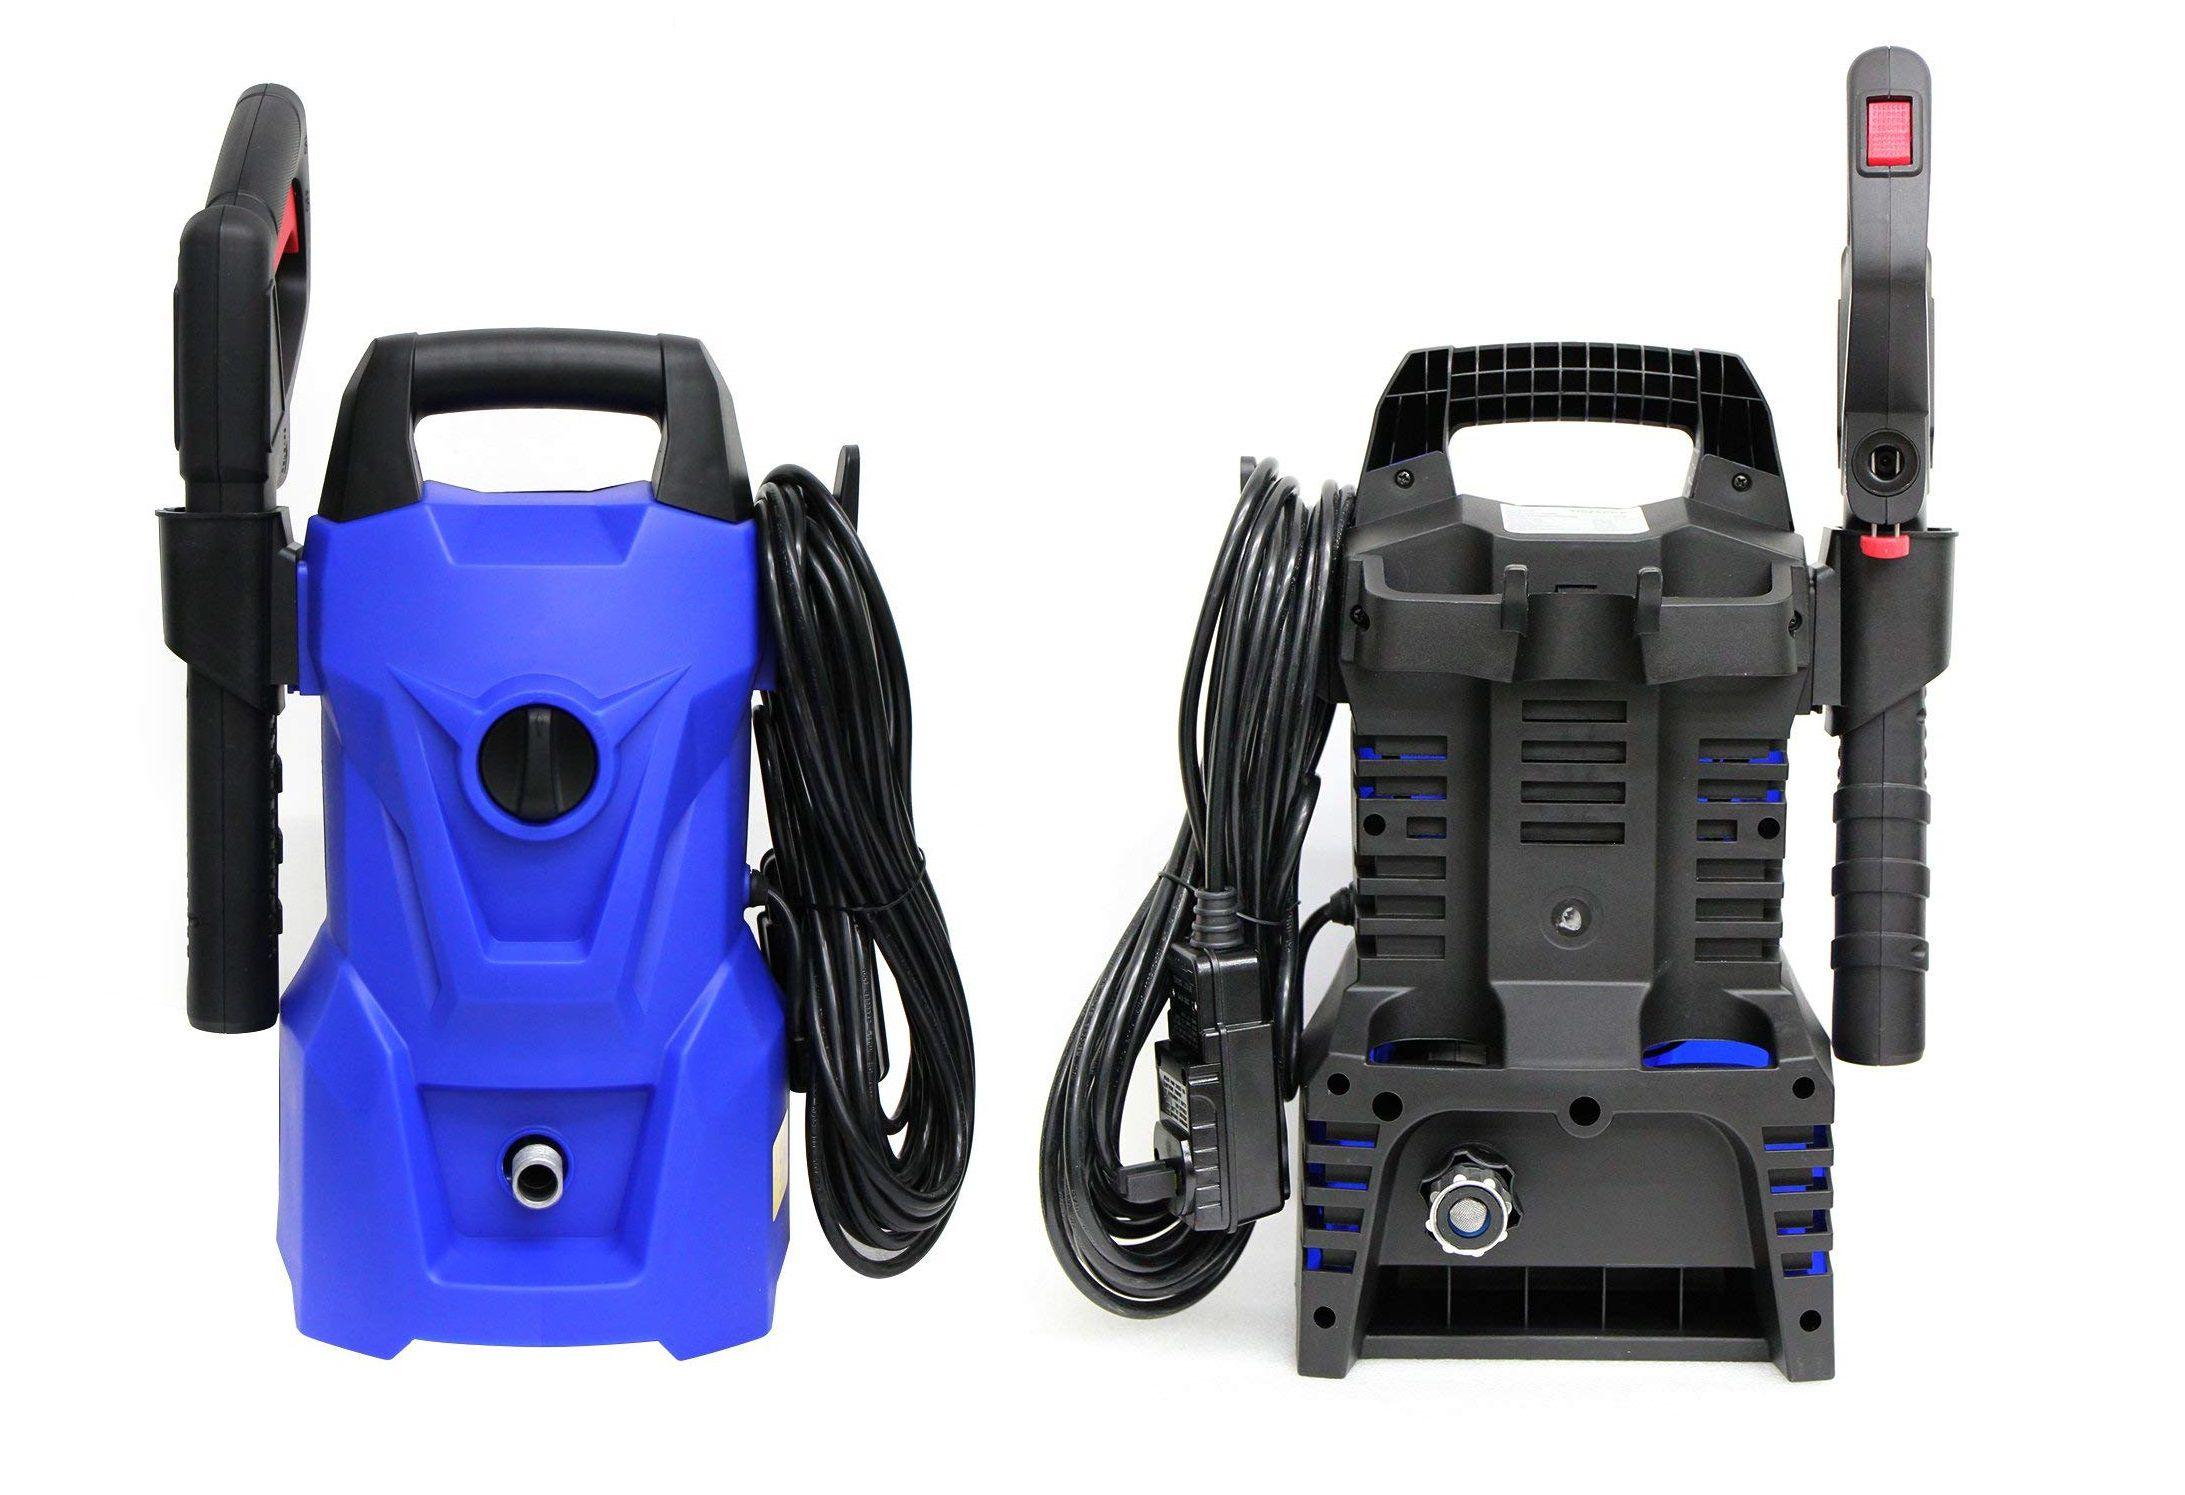 Azure Sky Electric Power Washer